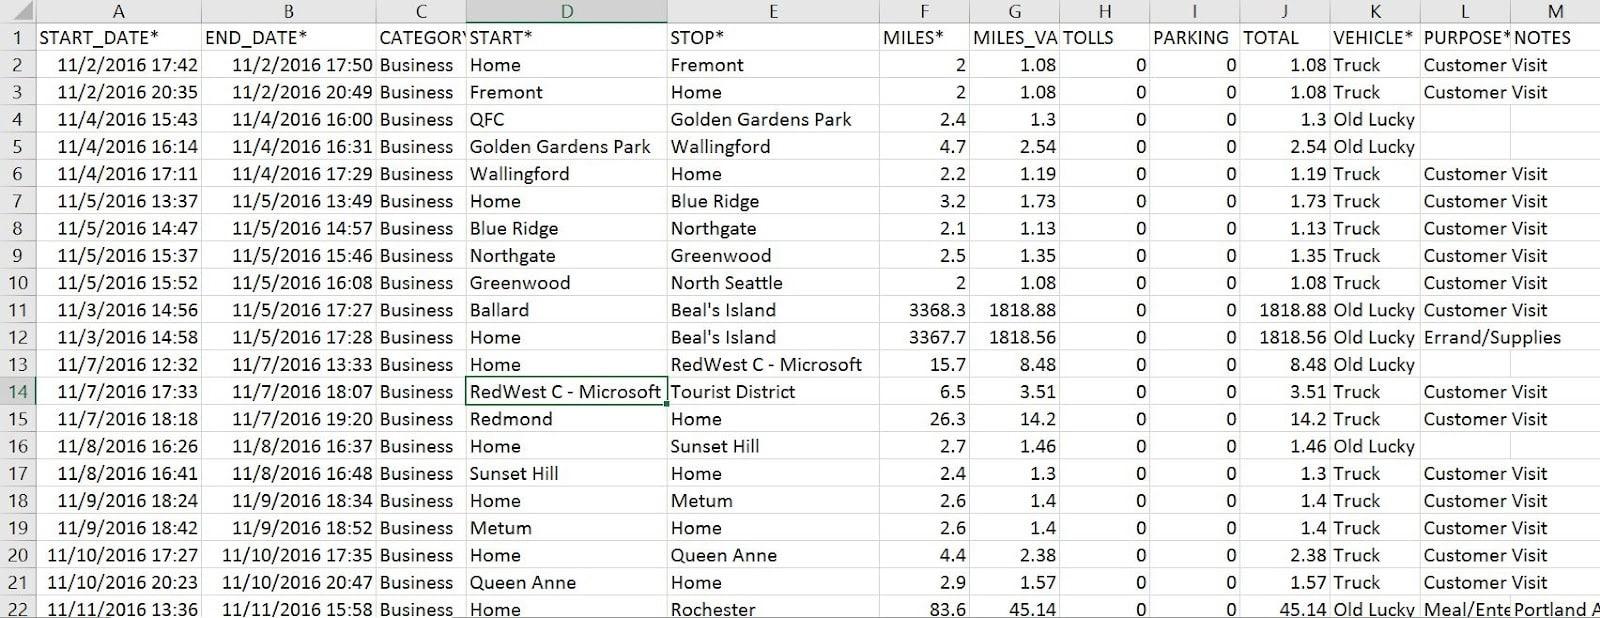 Screenshot of MileIQ Sample Report CSV Format